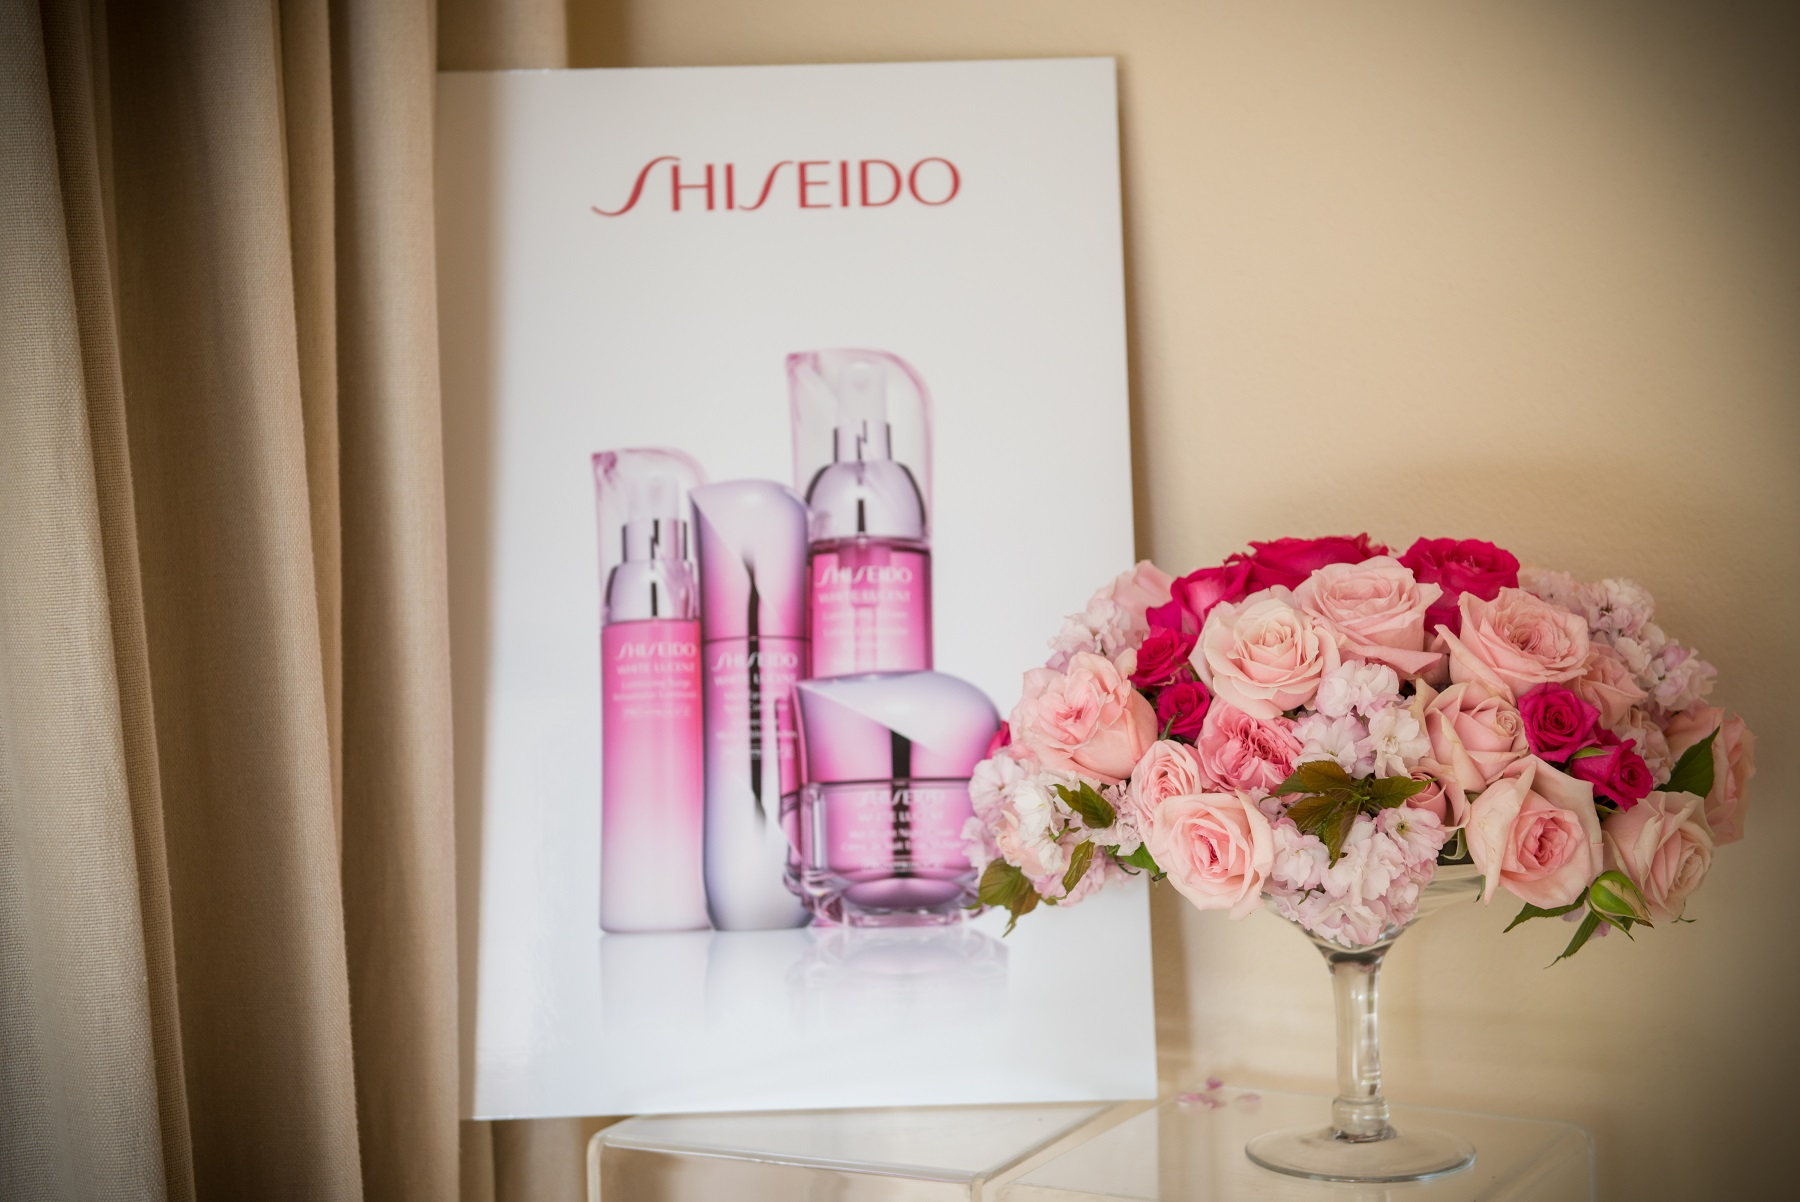 053_Shiseido2.jpg